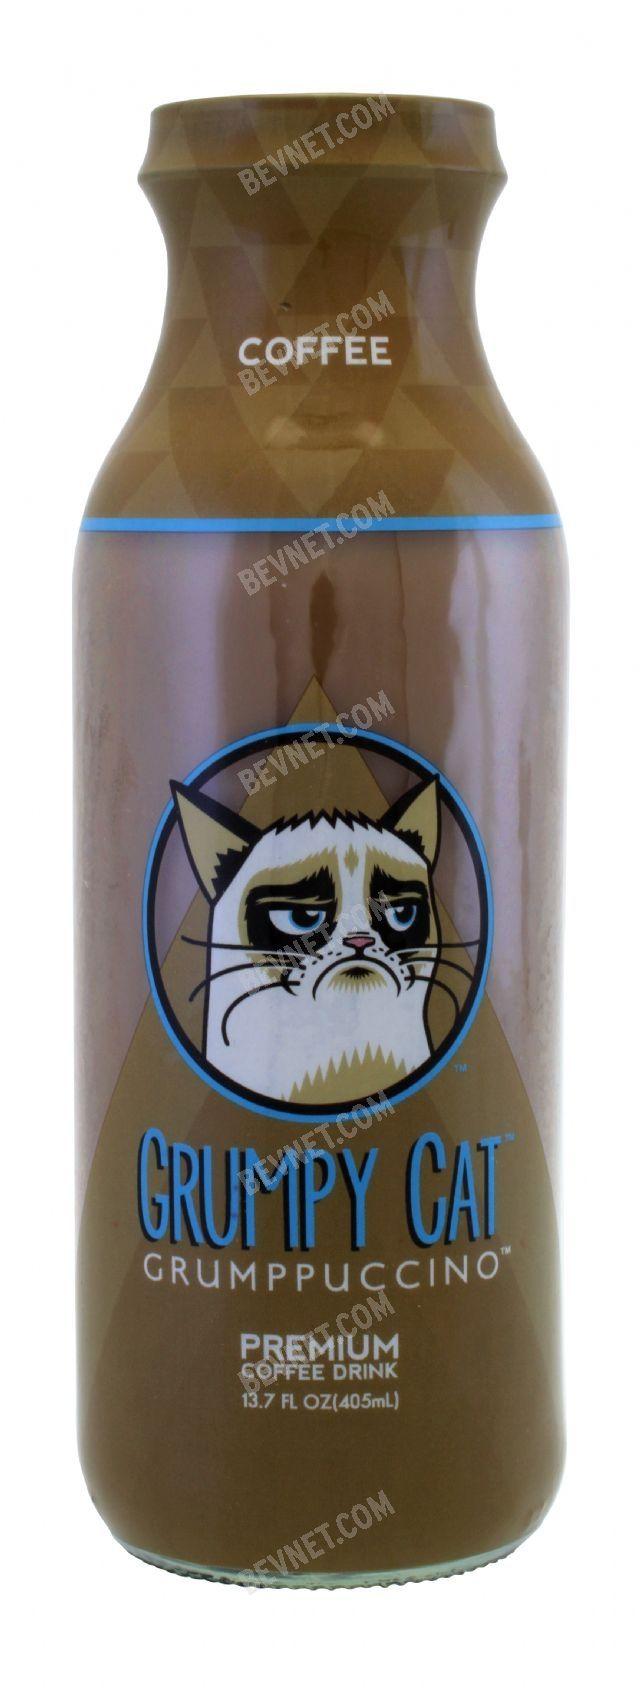 Grumpy Cat Grumppuccino: